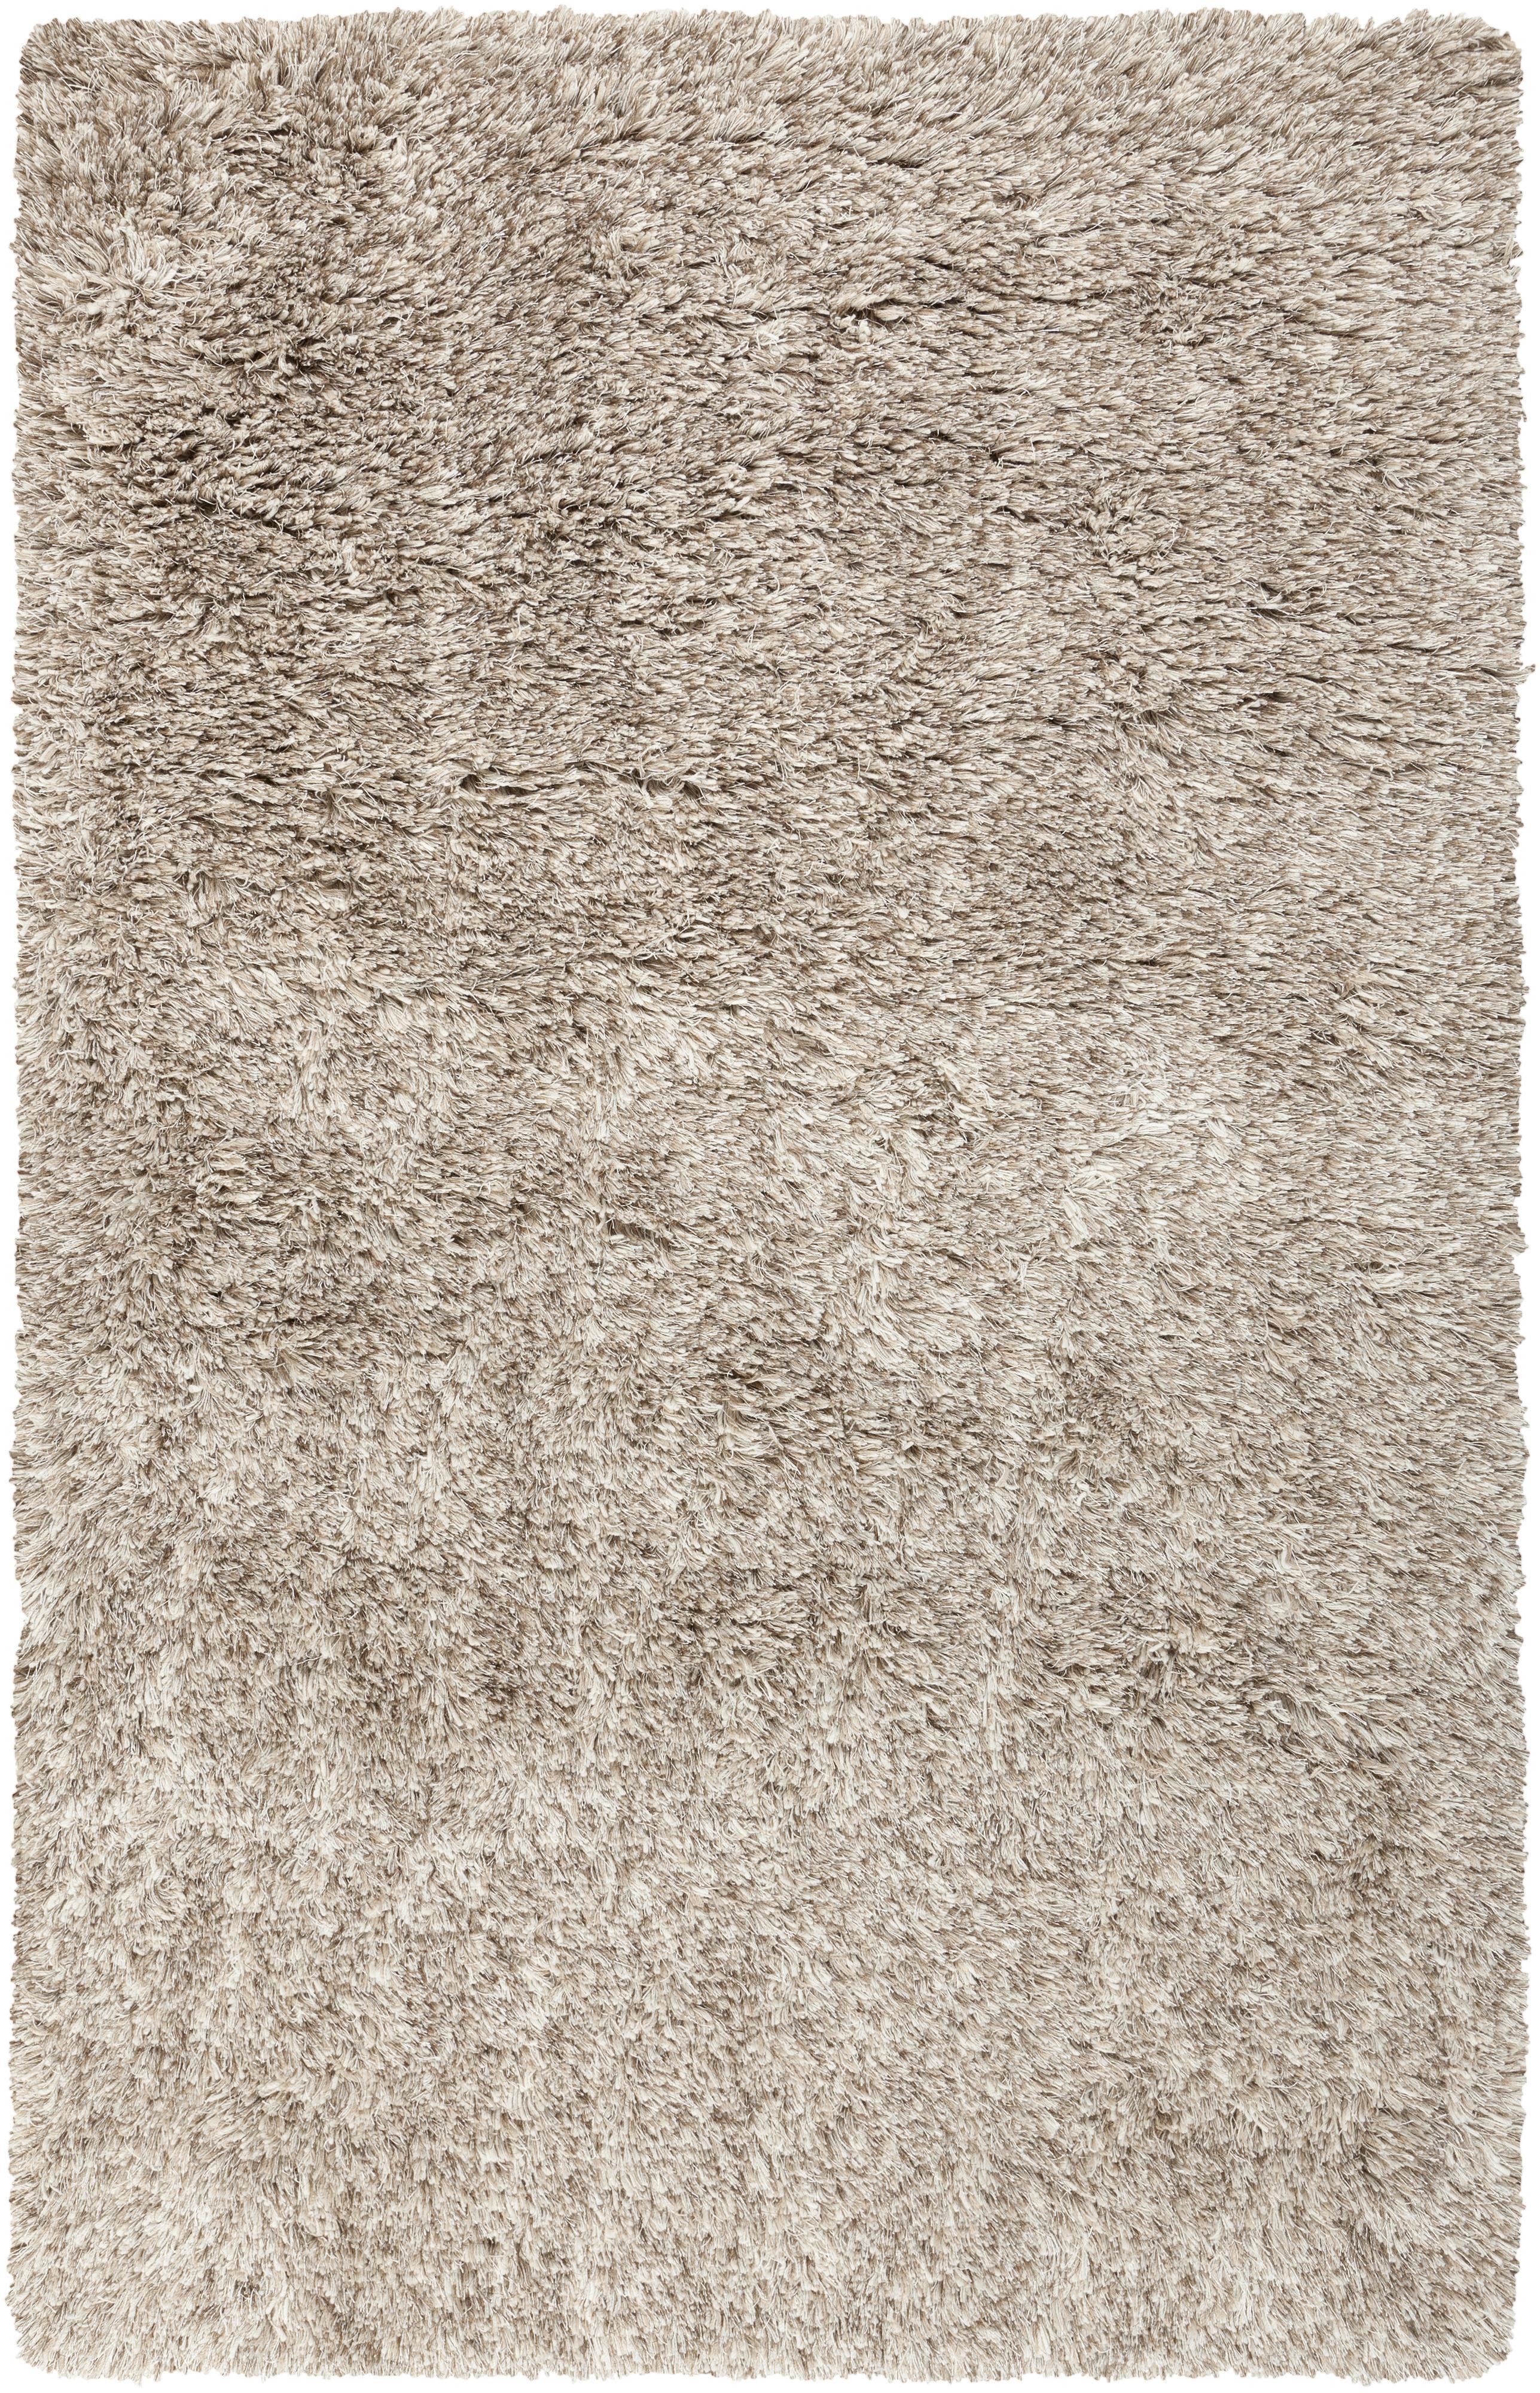 Surya Rugs Milan 5' x 8' - Item Number: MIL5001-58